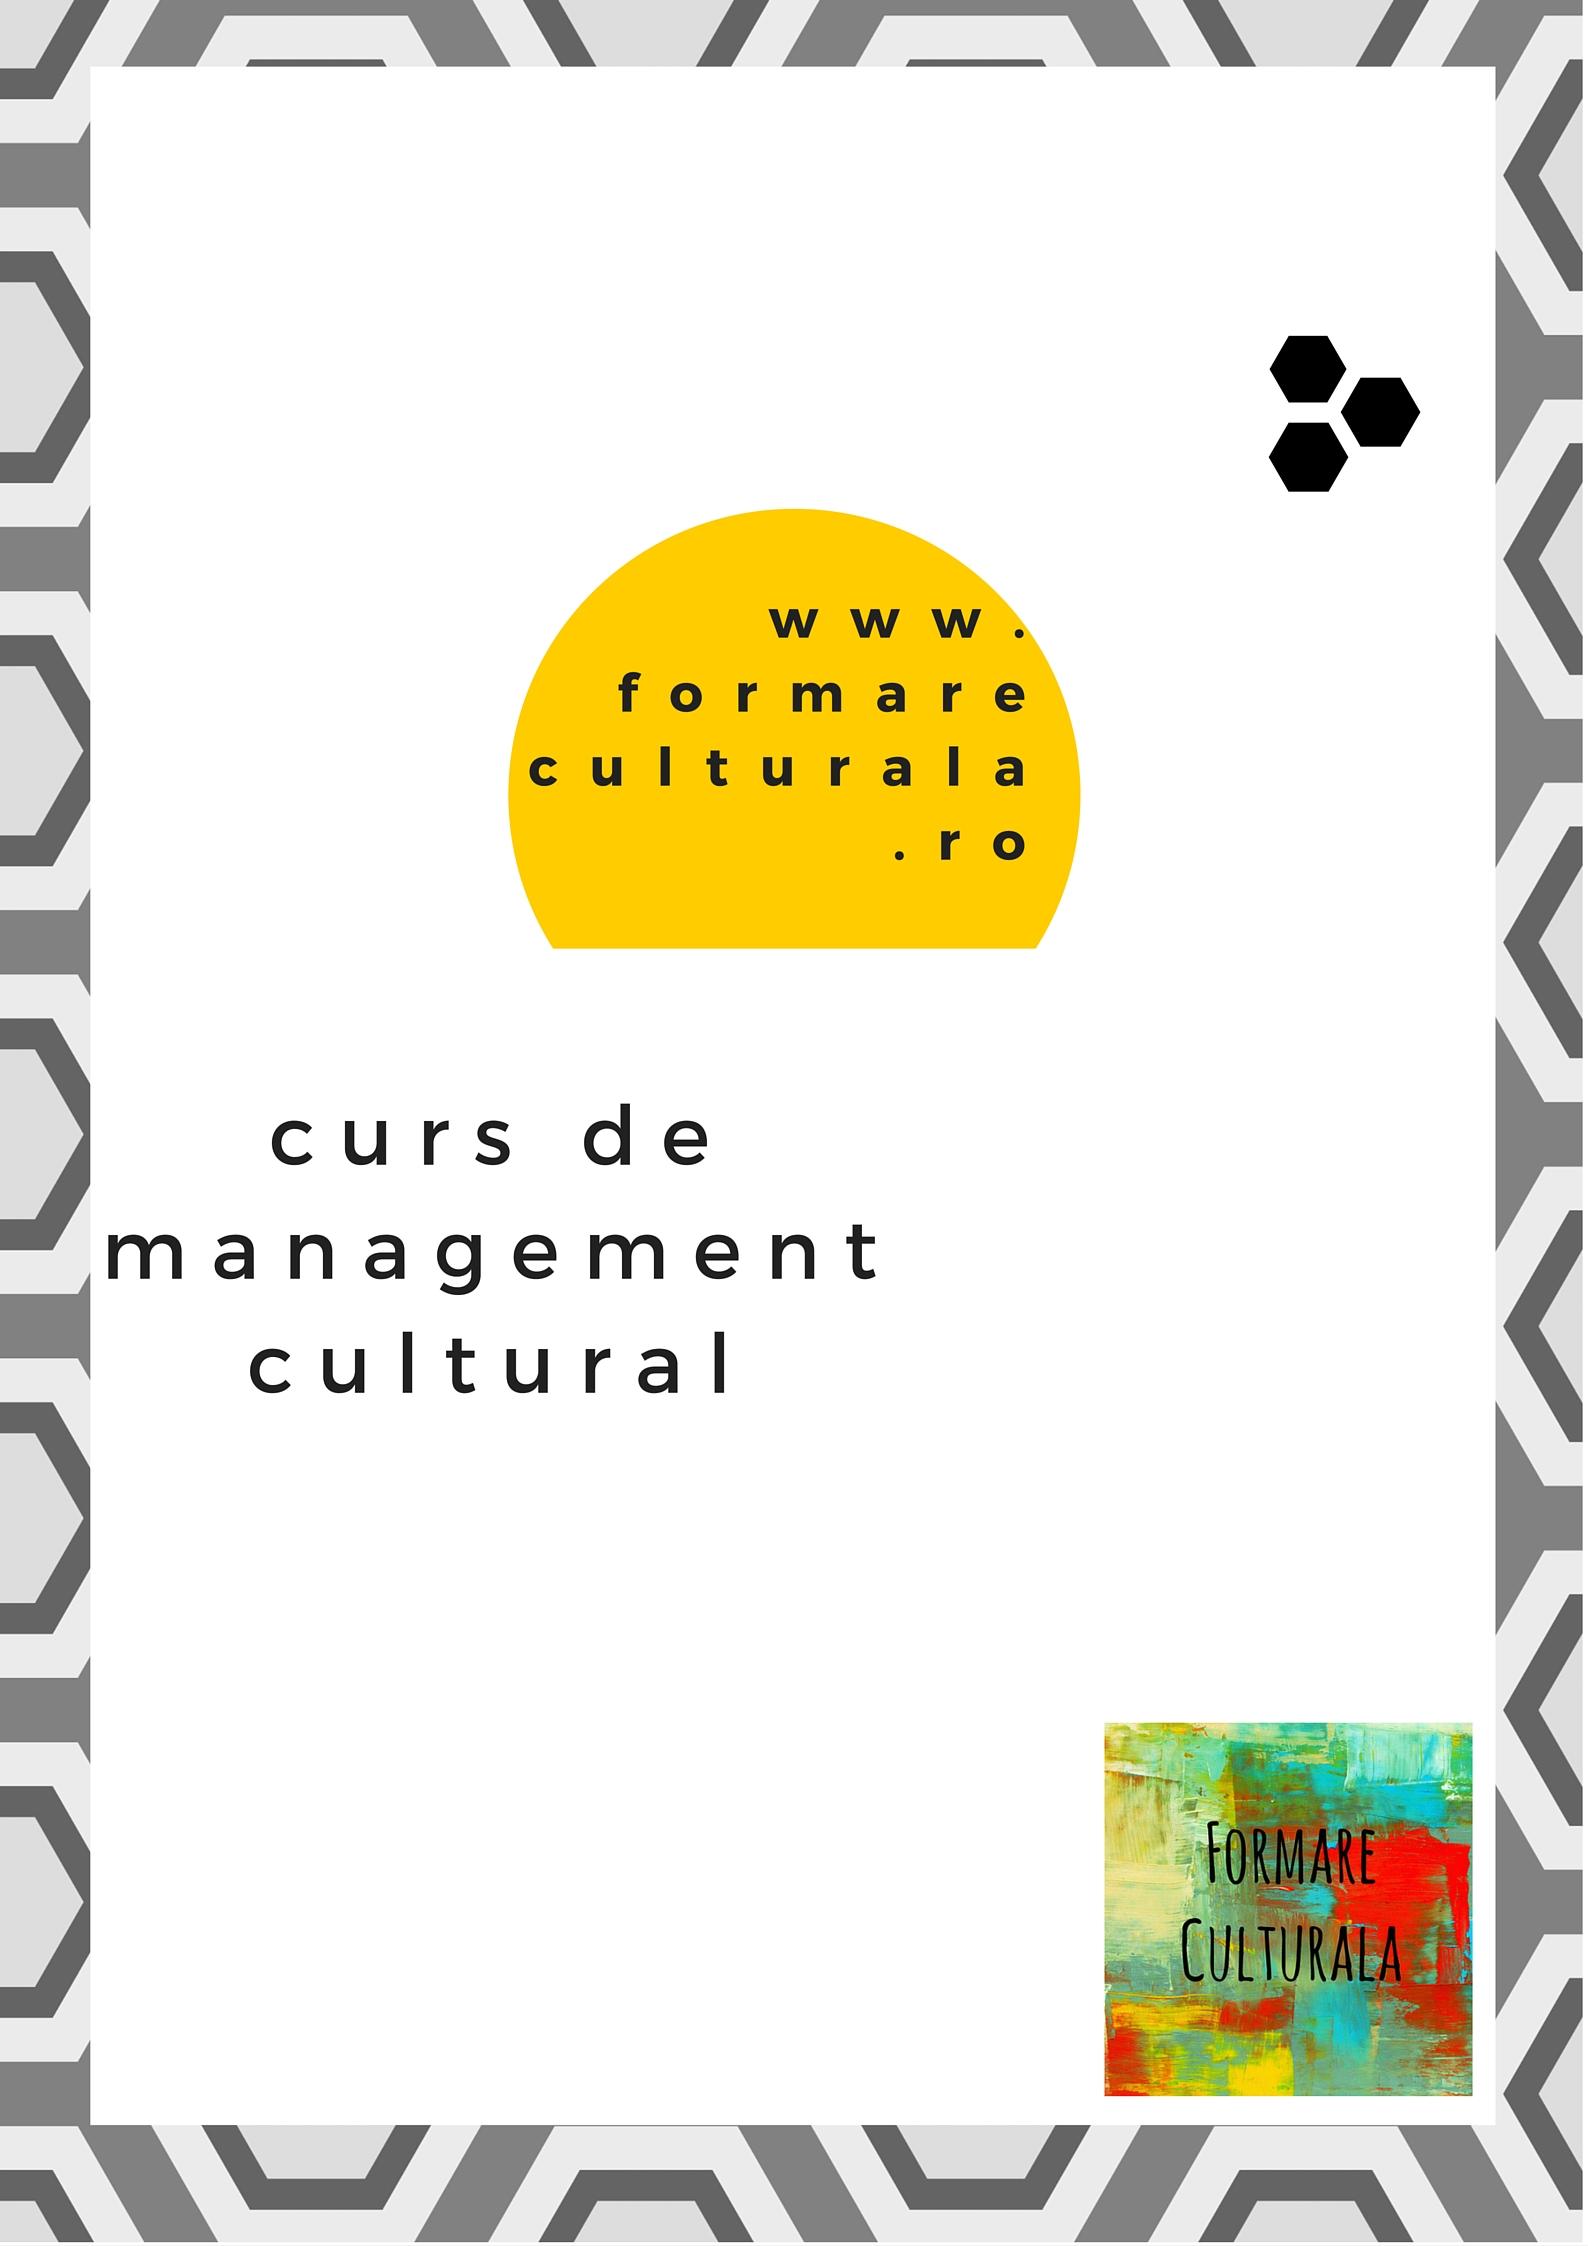 Management cultural